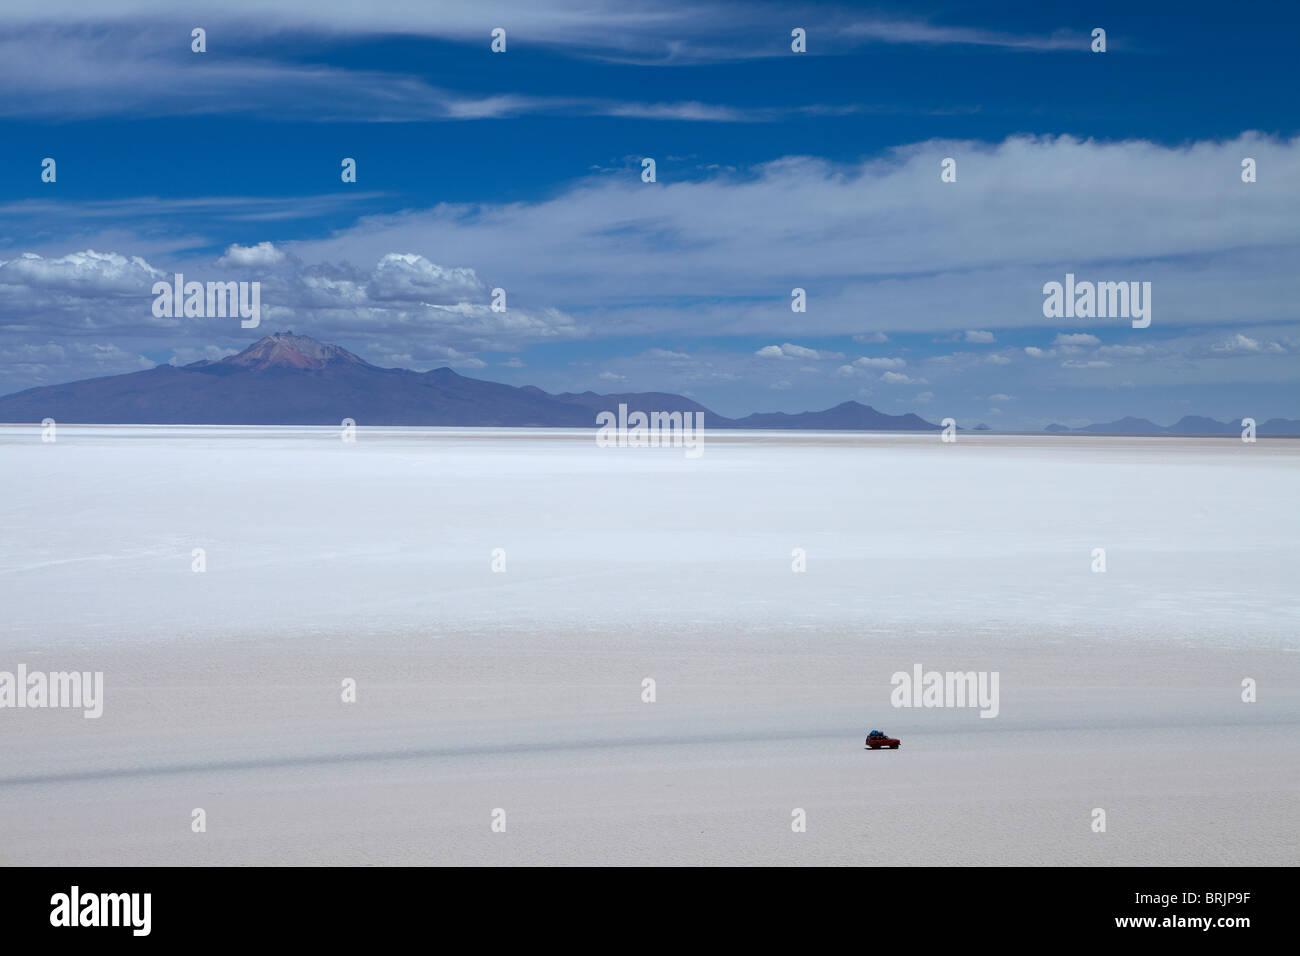 Un véhicule isolé sur le Salar de Uyuni, Bolivie Photo Stock